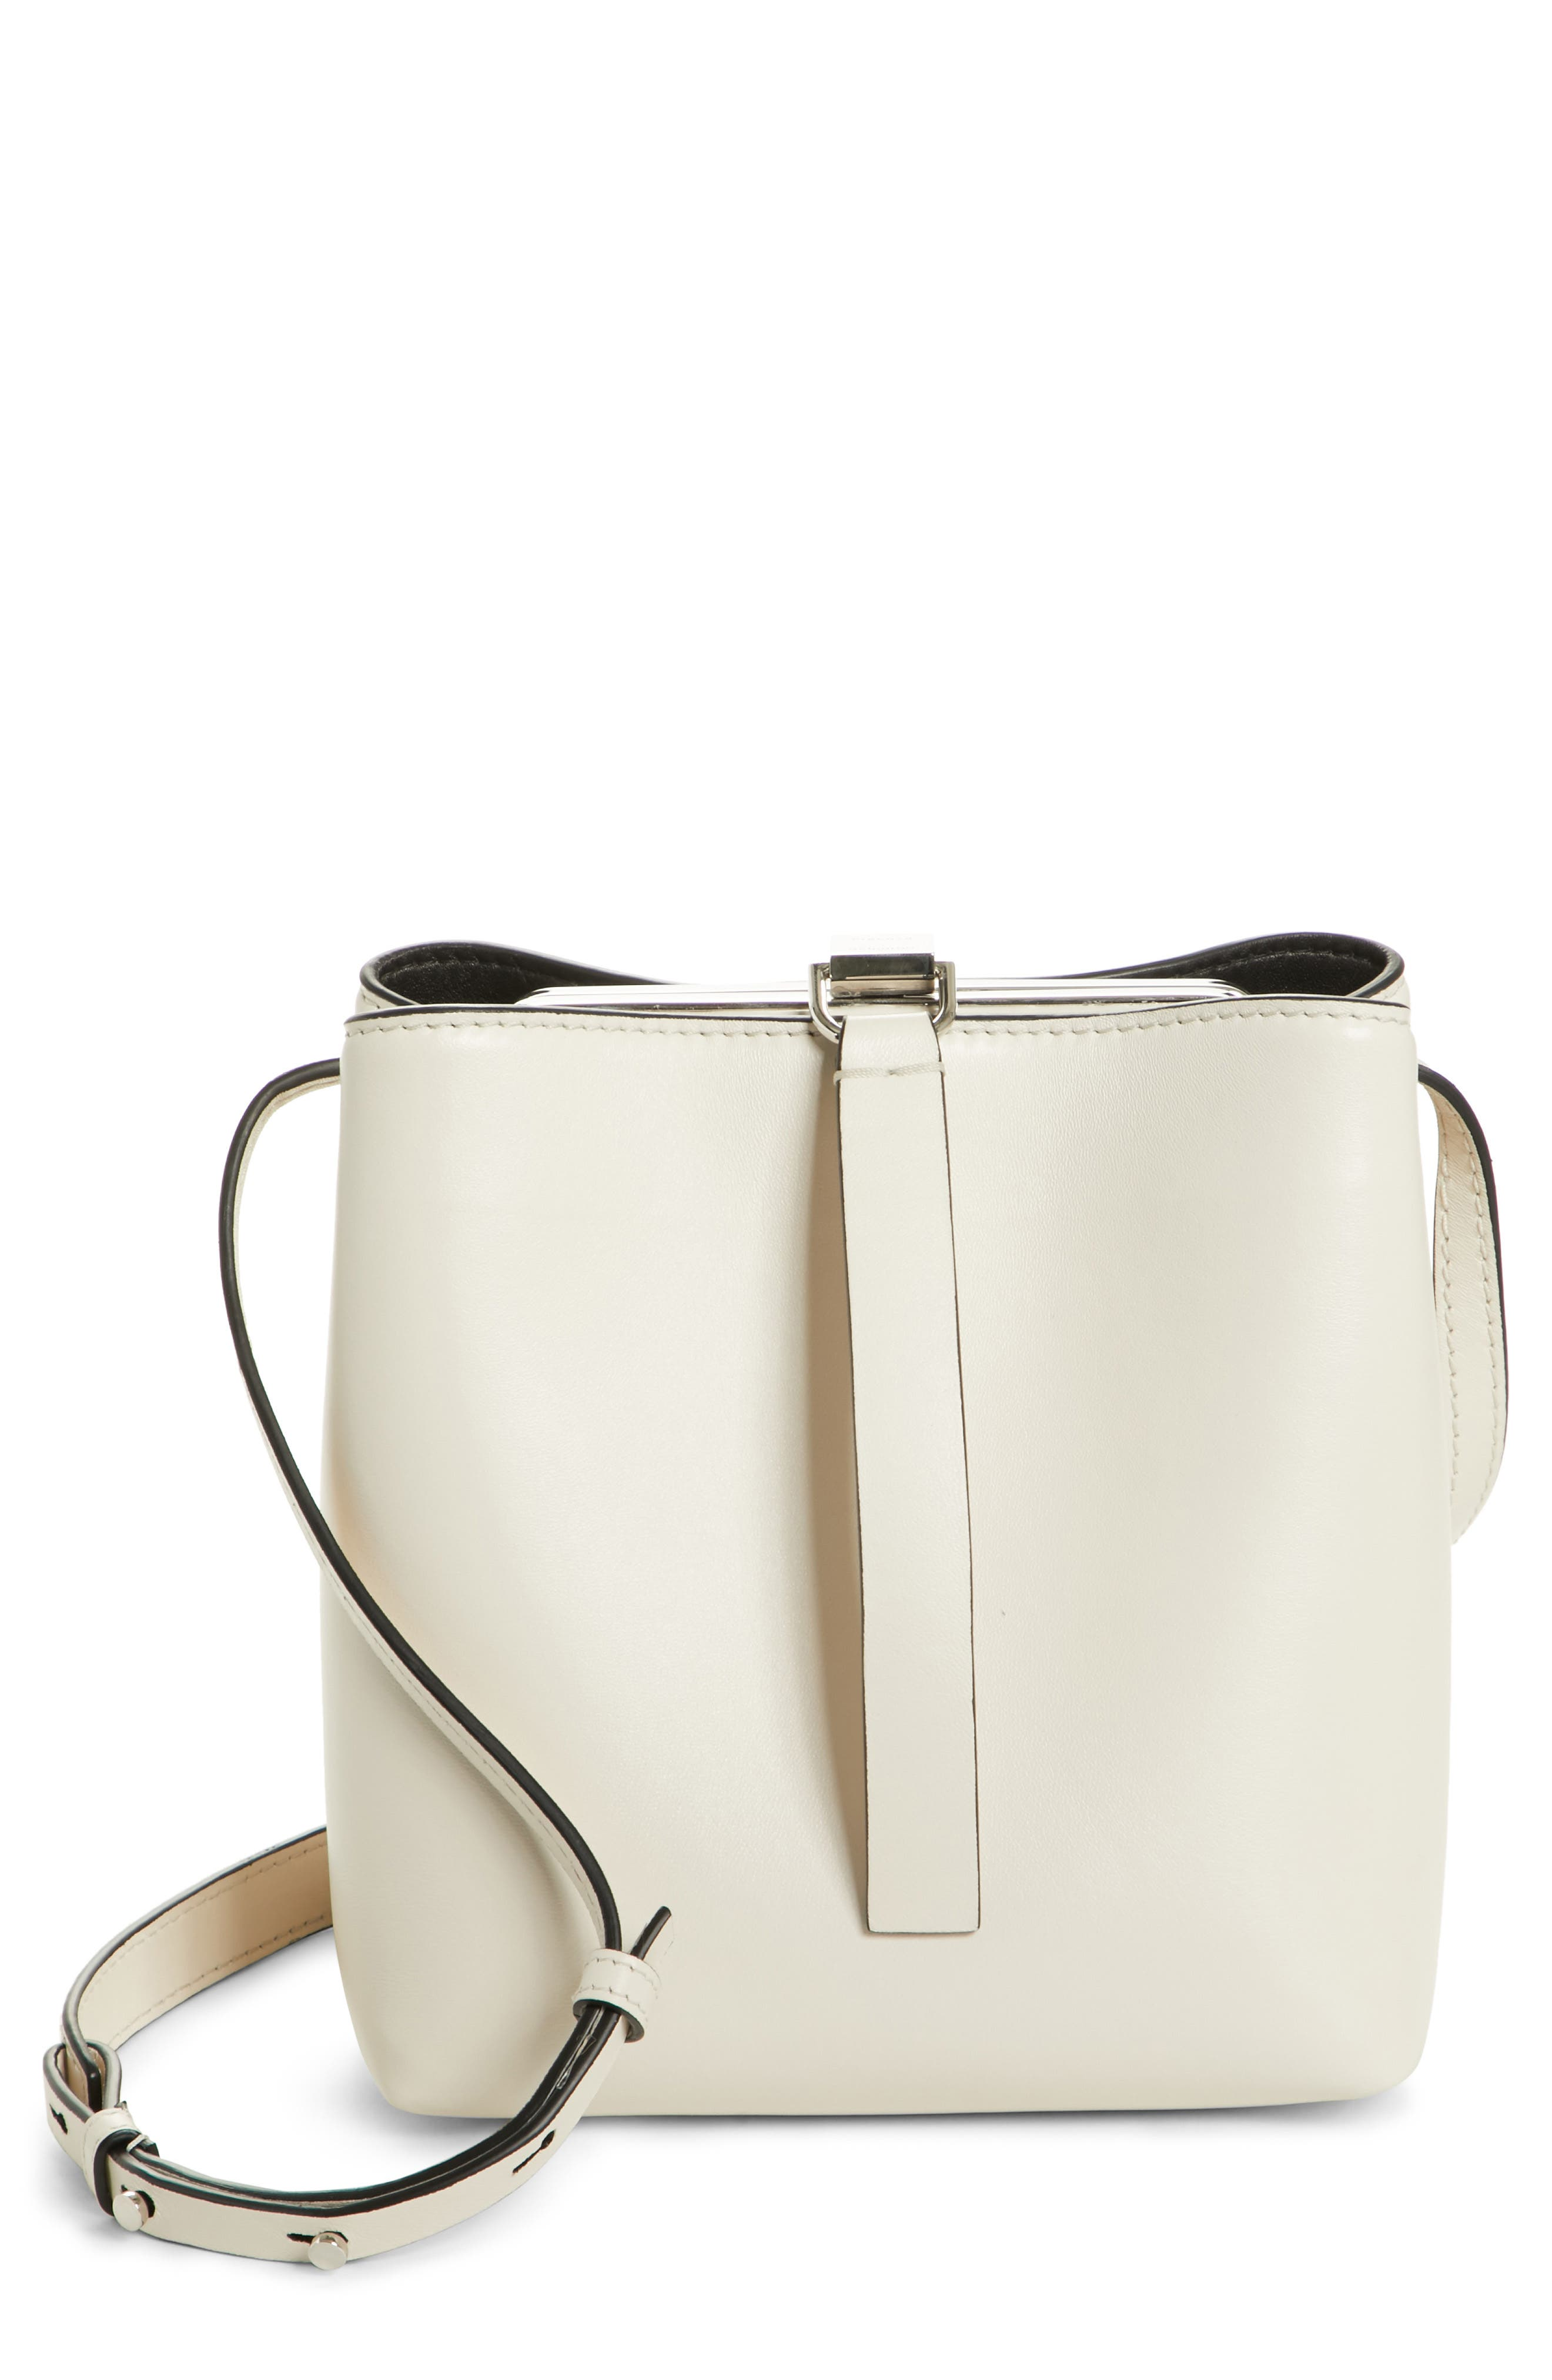 Frame Leather Crossbody Bag,                             Main thumbnail 1, color,                             CLAY/ BLACK